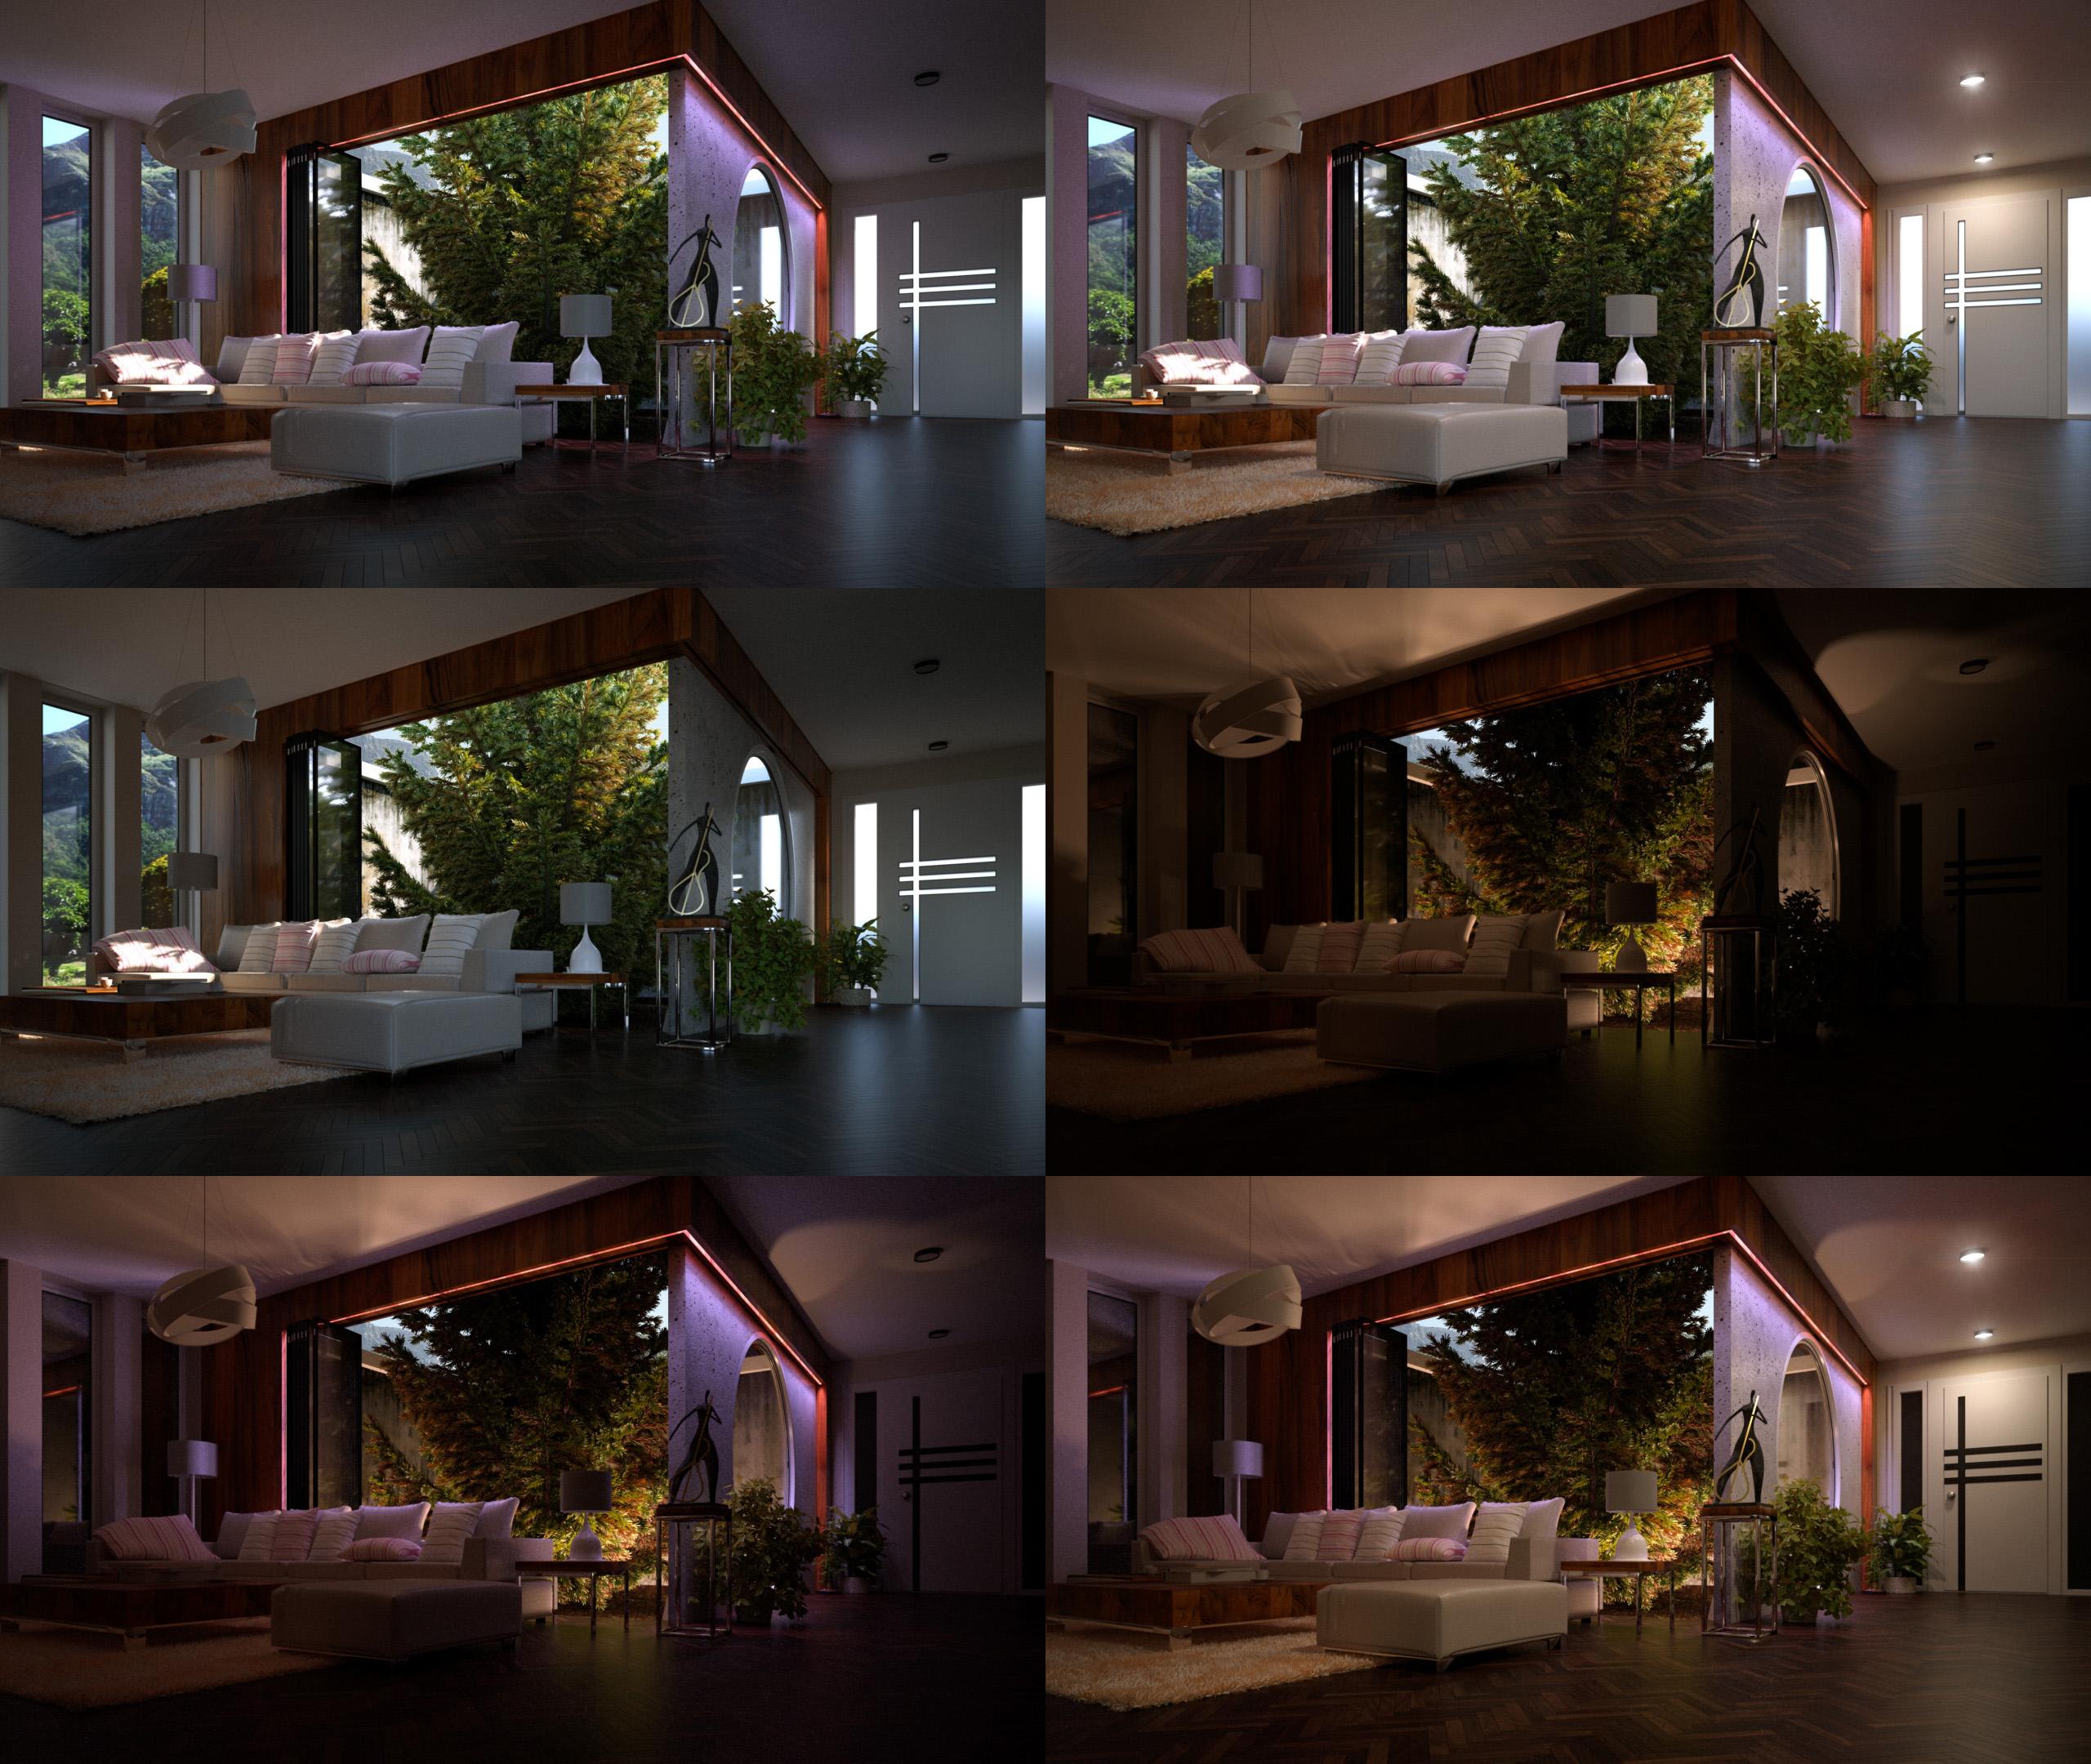 Livingroom Fantasy By M-Pixel On DeviantArt